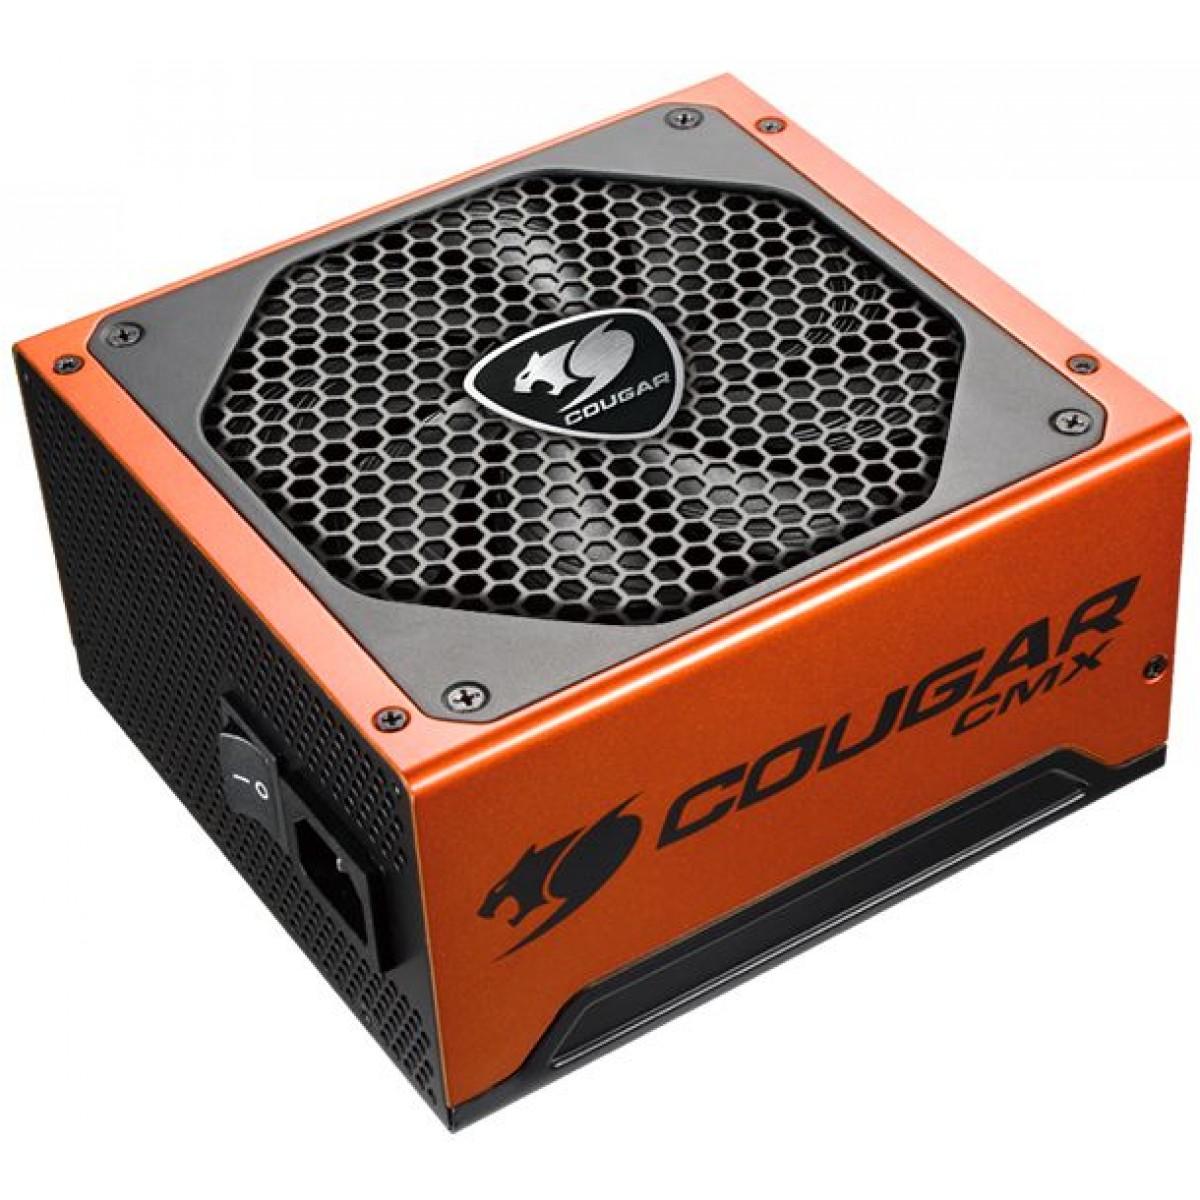 Fonte Cougar CMX 1200W, 80 Plus Bronze, Semi Modular, PFC Ativo